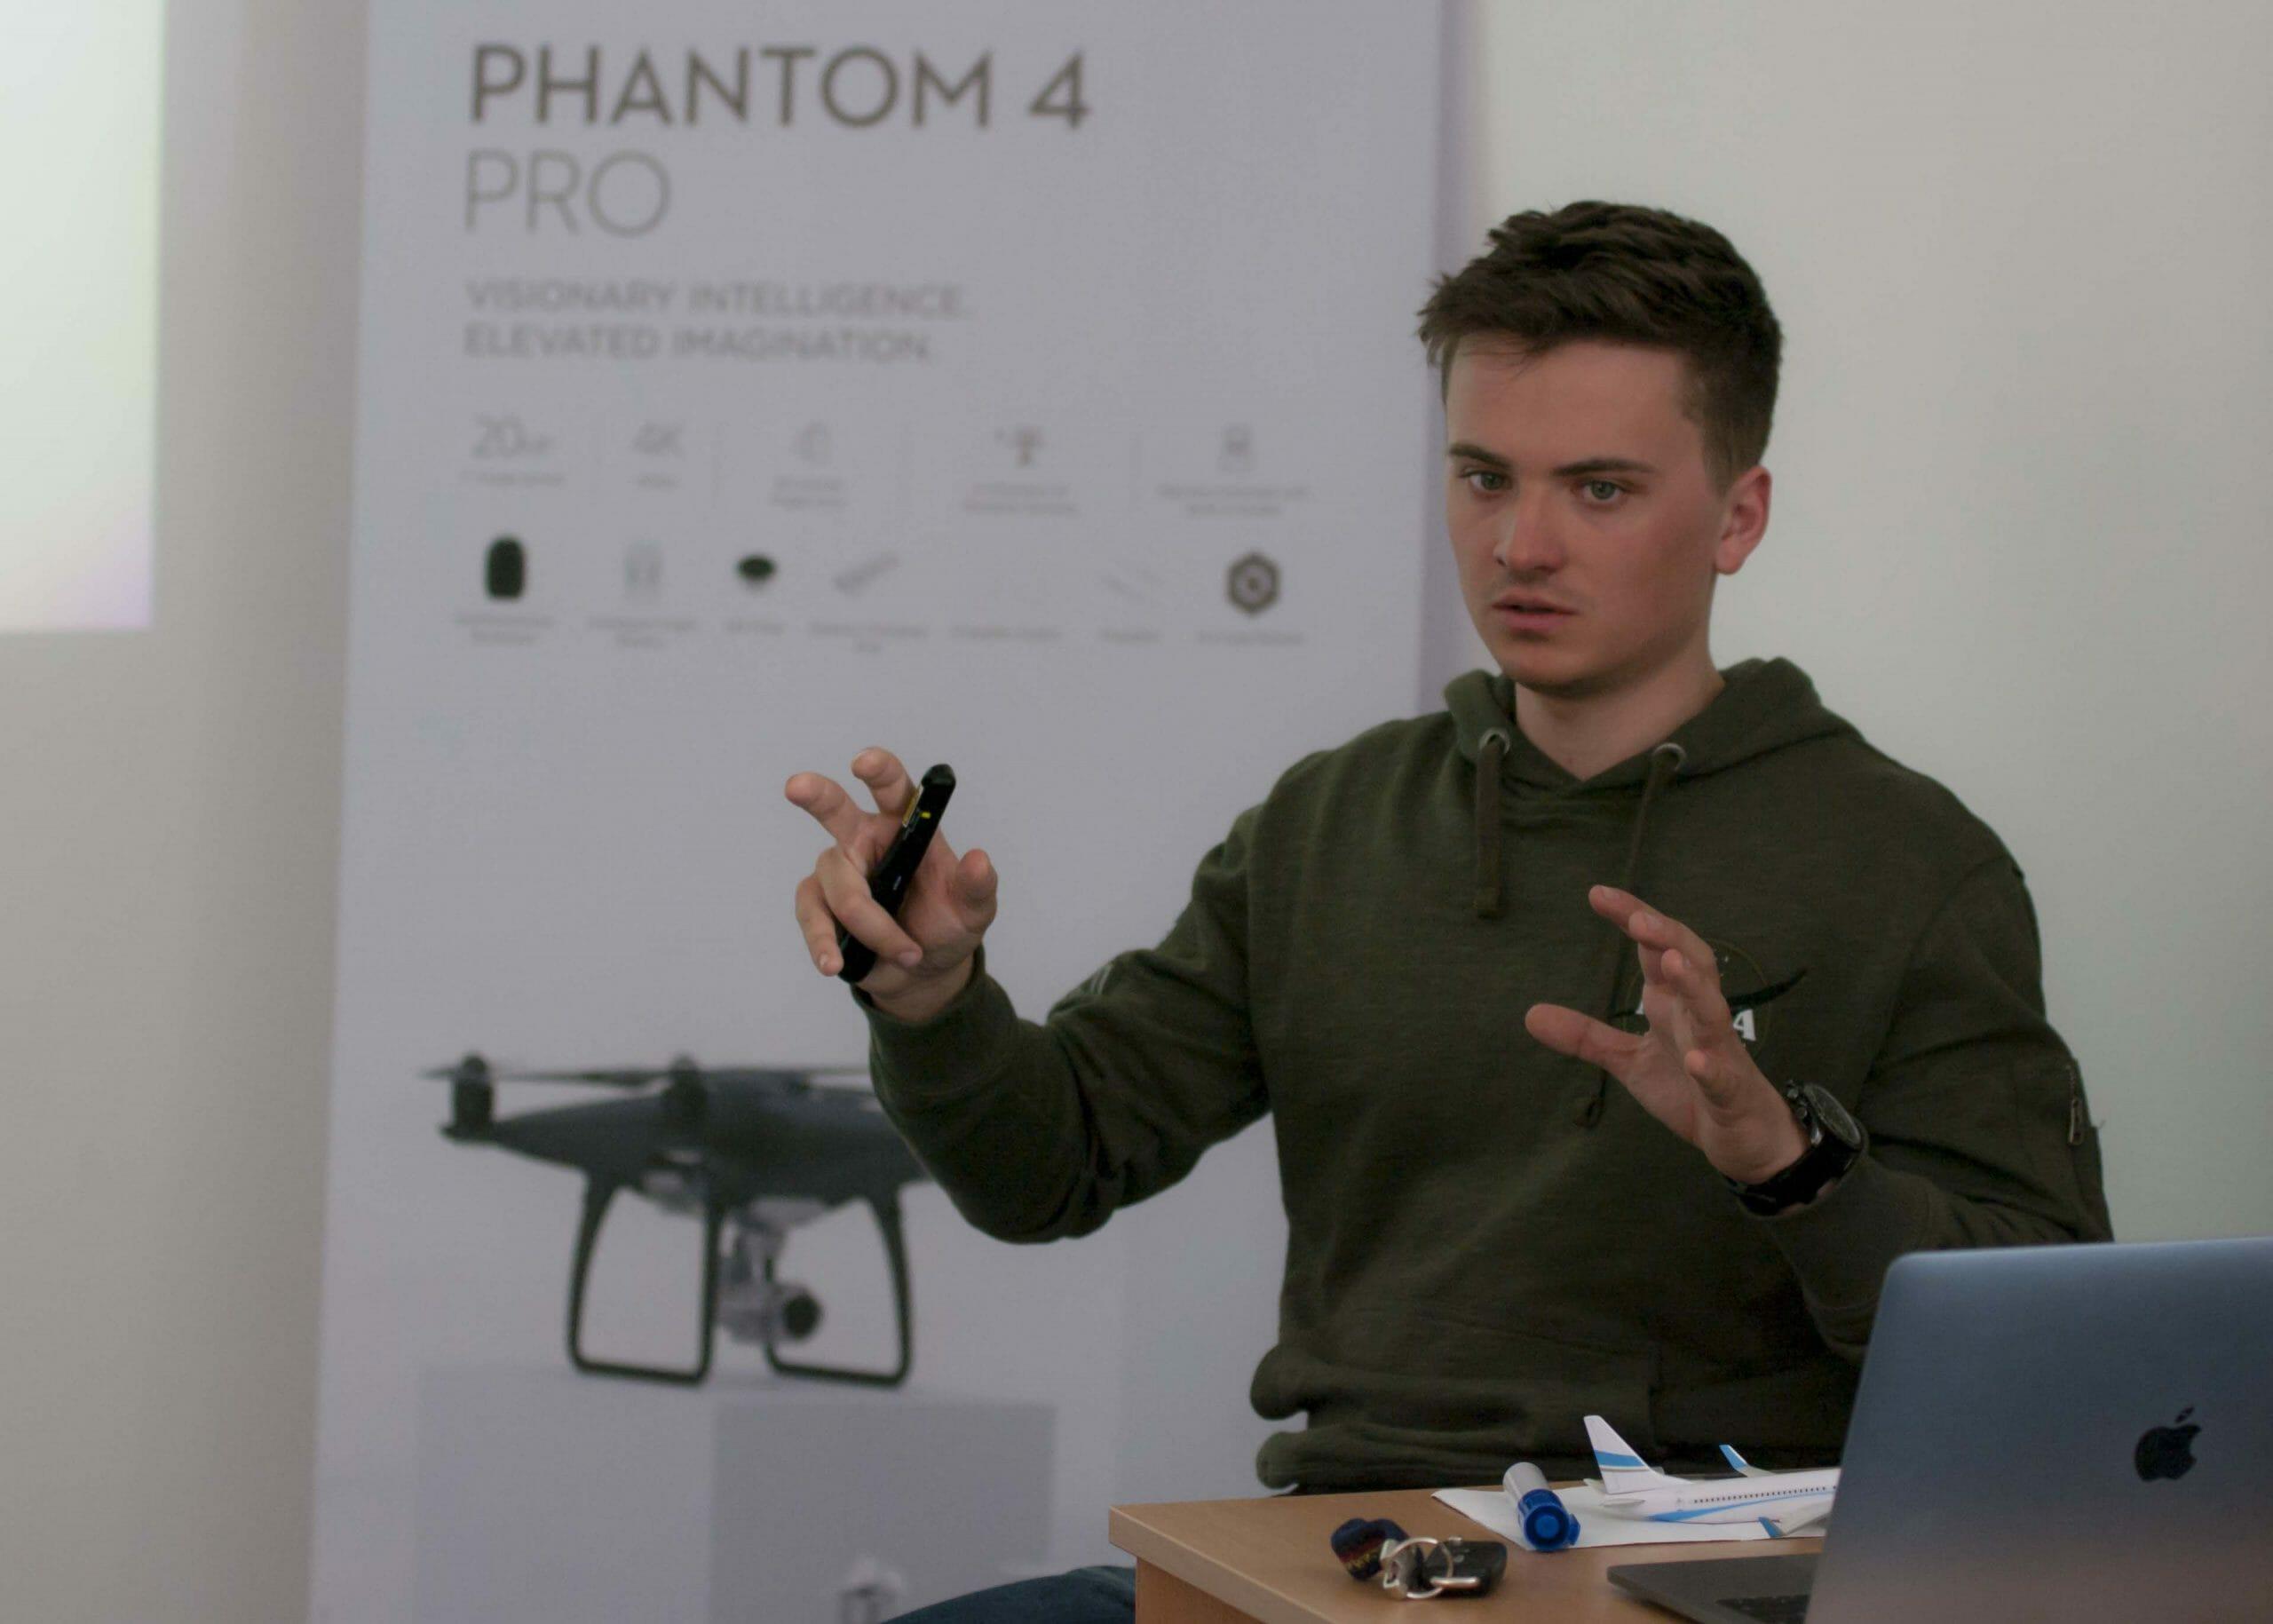 Teoretický kurz dronov online